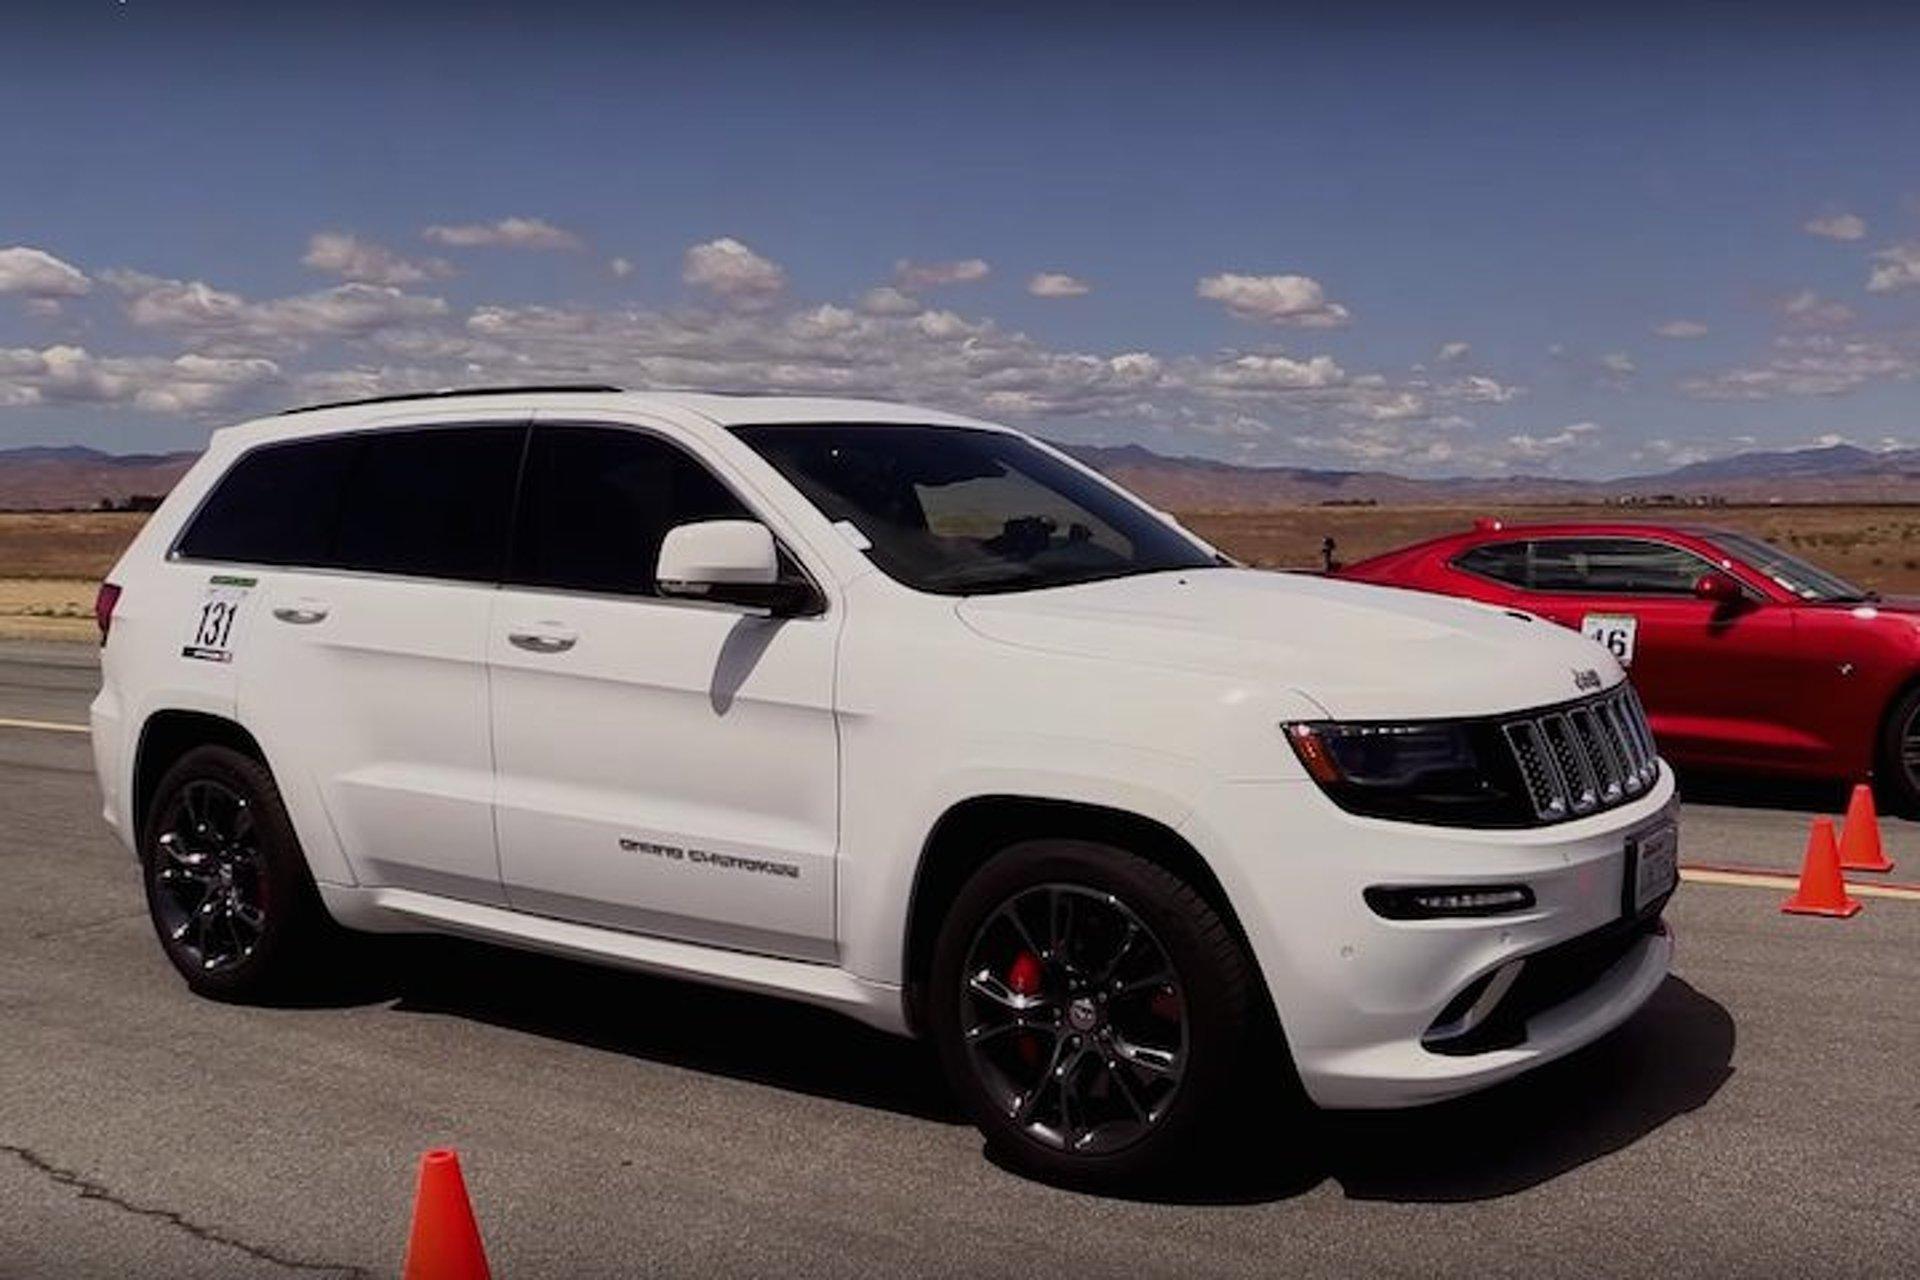 2016 Camaro SS vs Grand Cherokee SRT Can Jeep Hang Tough